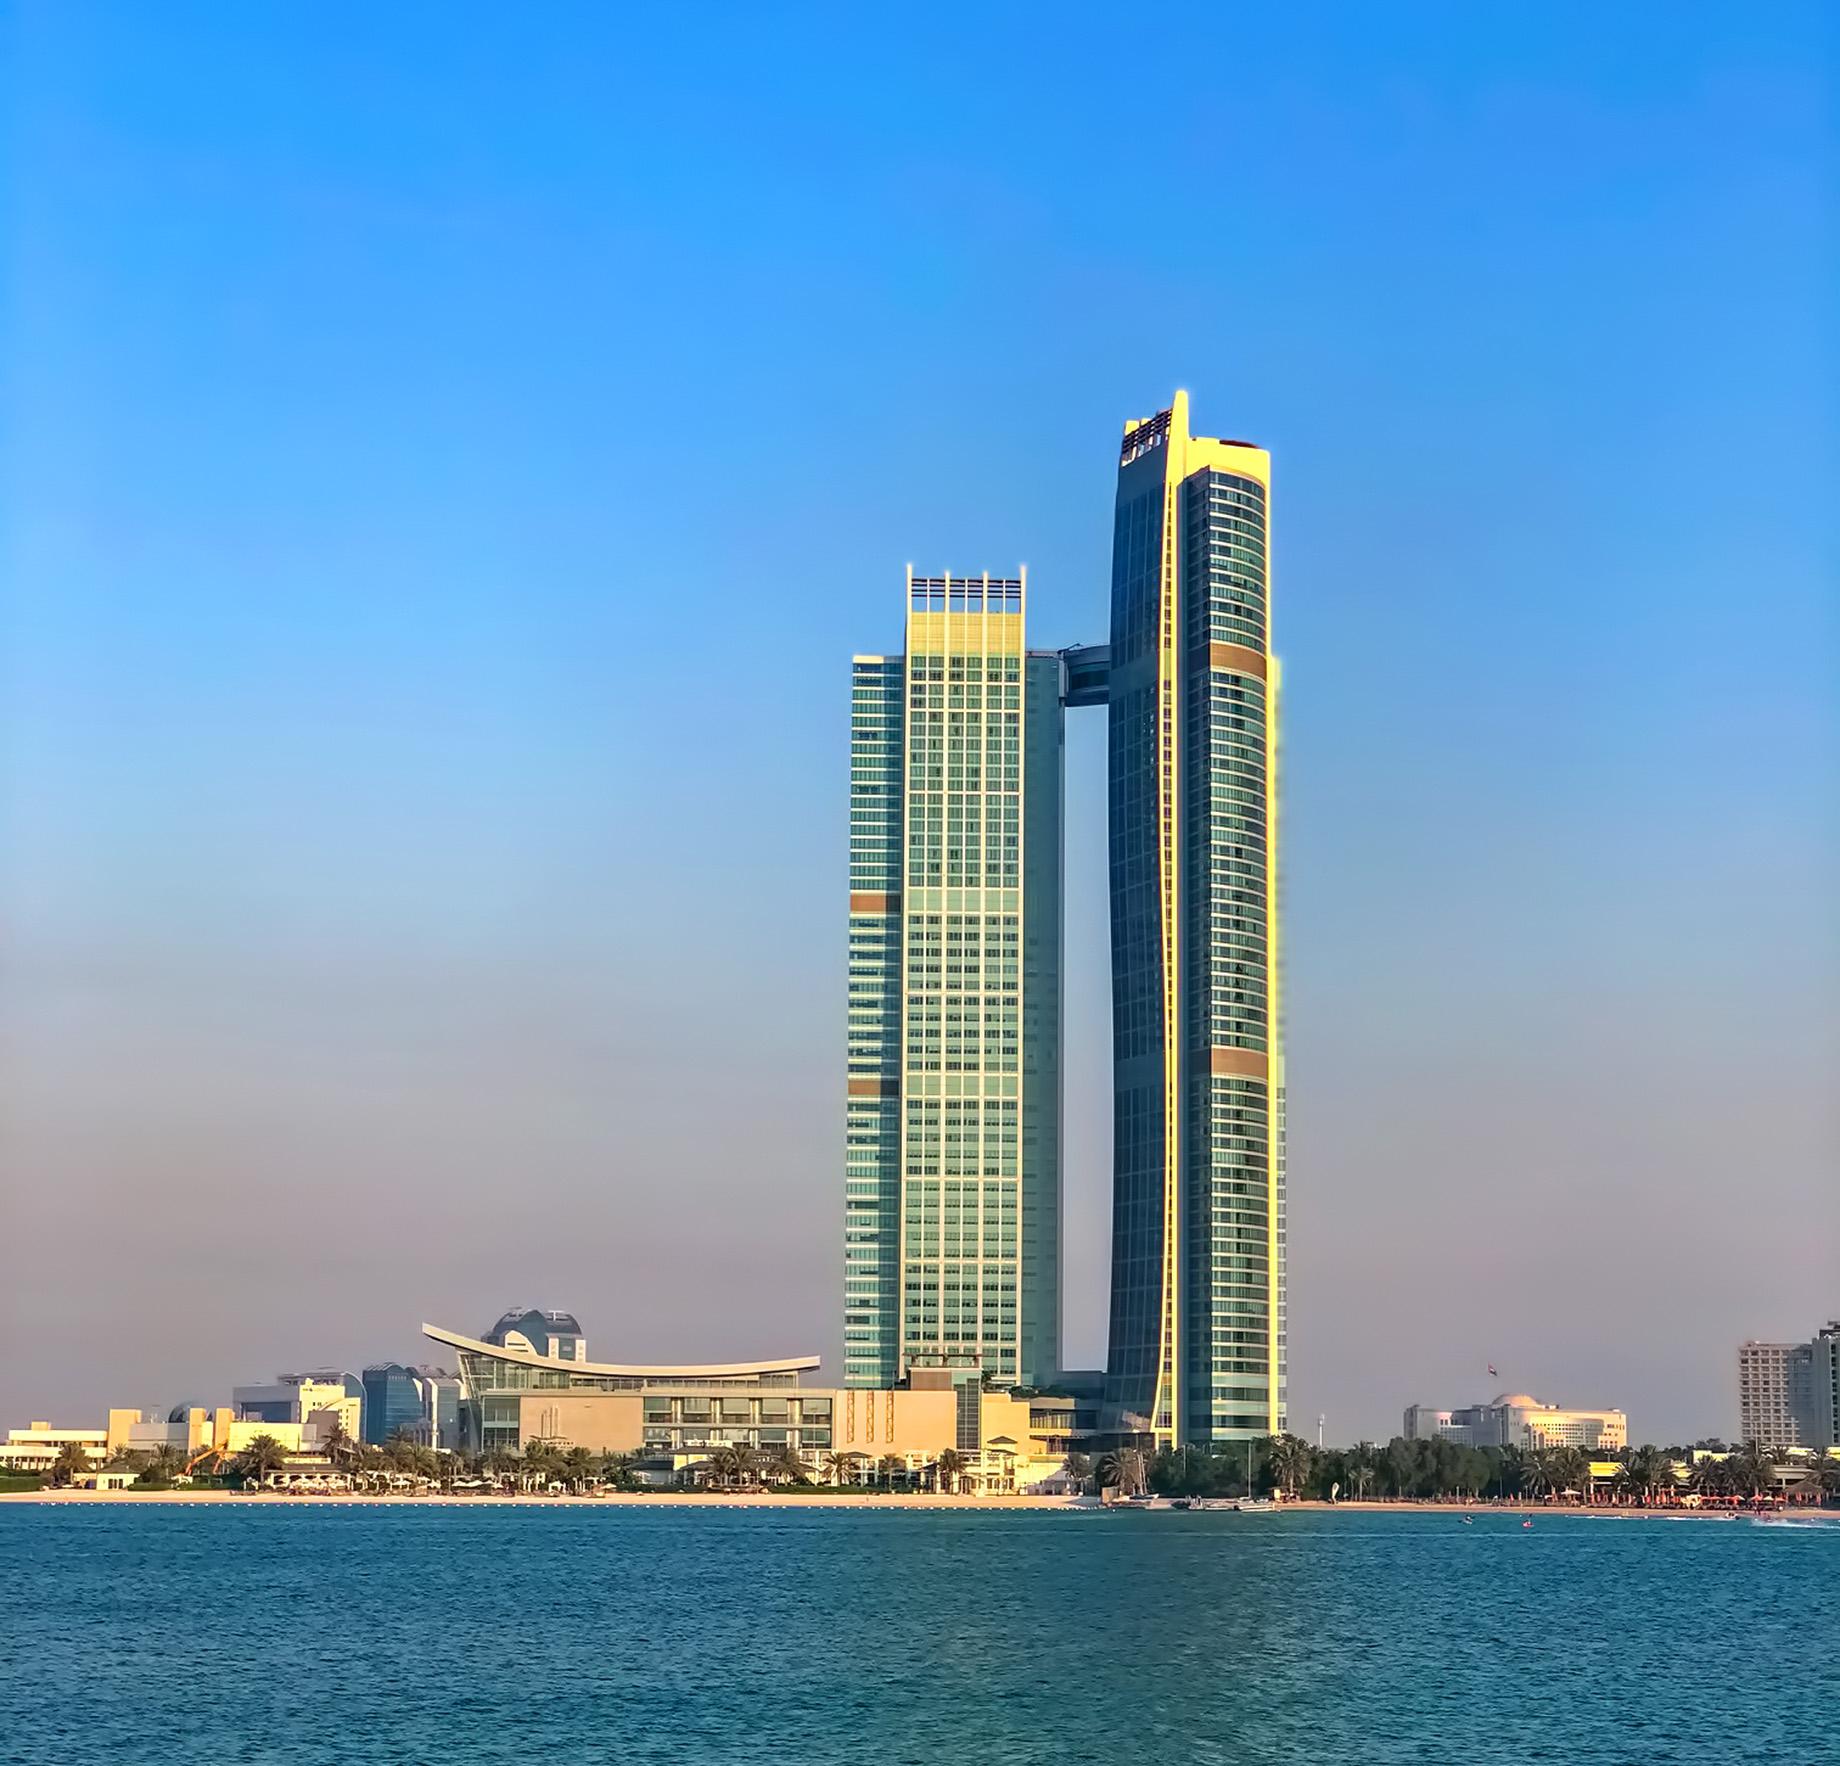 The St. Regis Abu Dhabi Luxury Hotel - Abu Dhabi, UAE